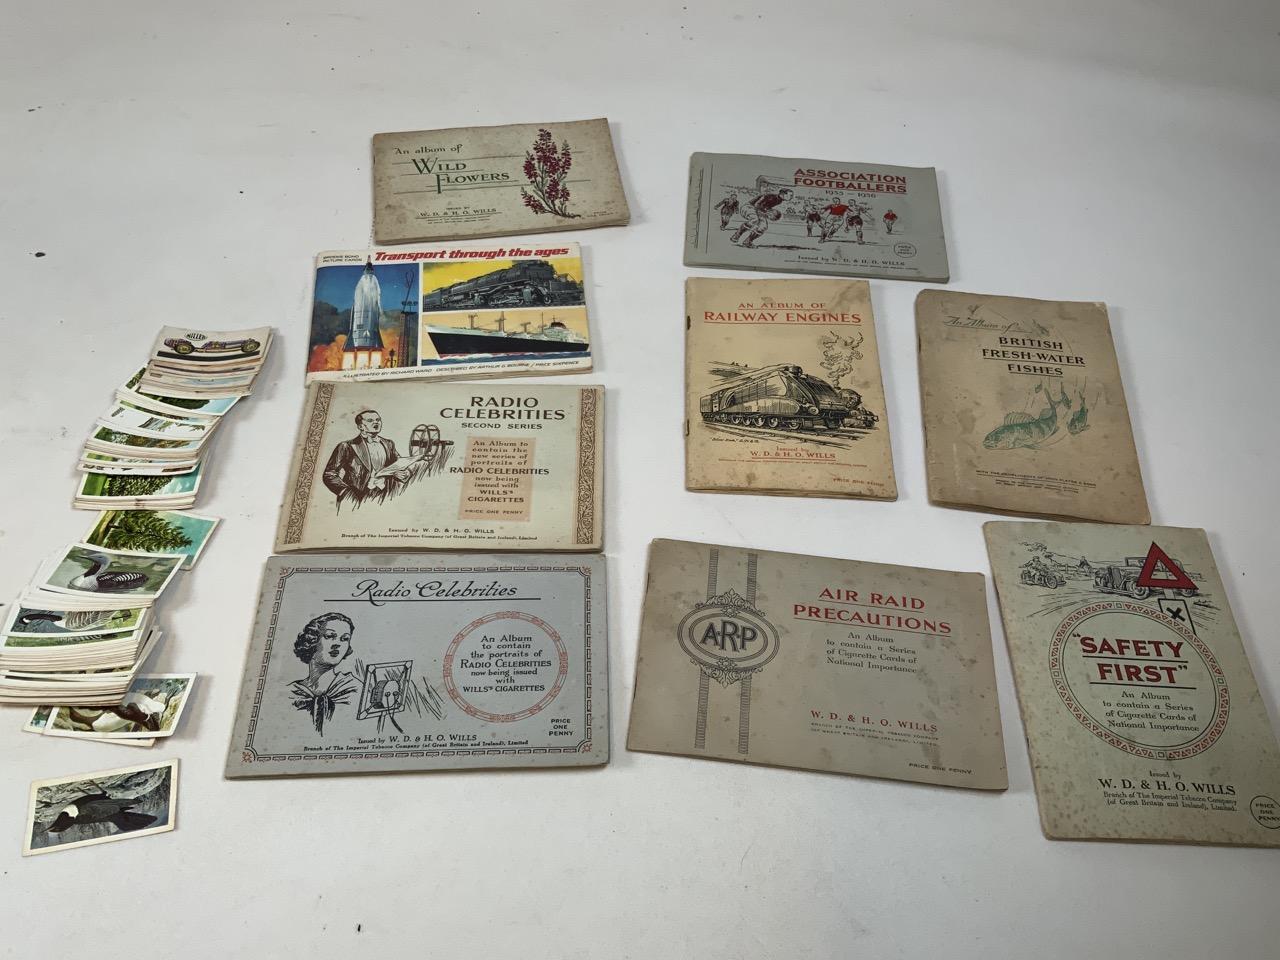 Nine cigarette card albums including Association footballers 1935-1936, Radio celebrities, An